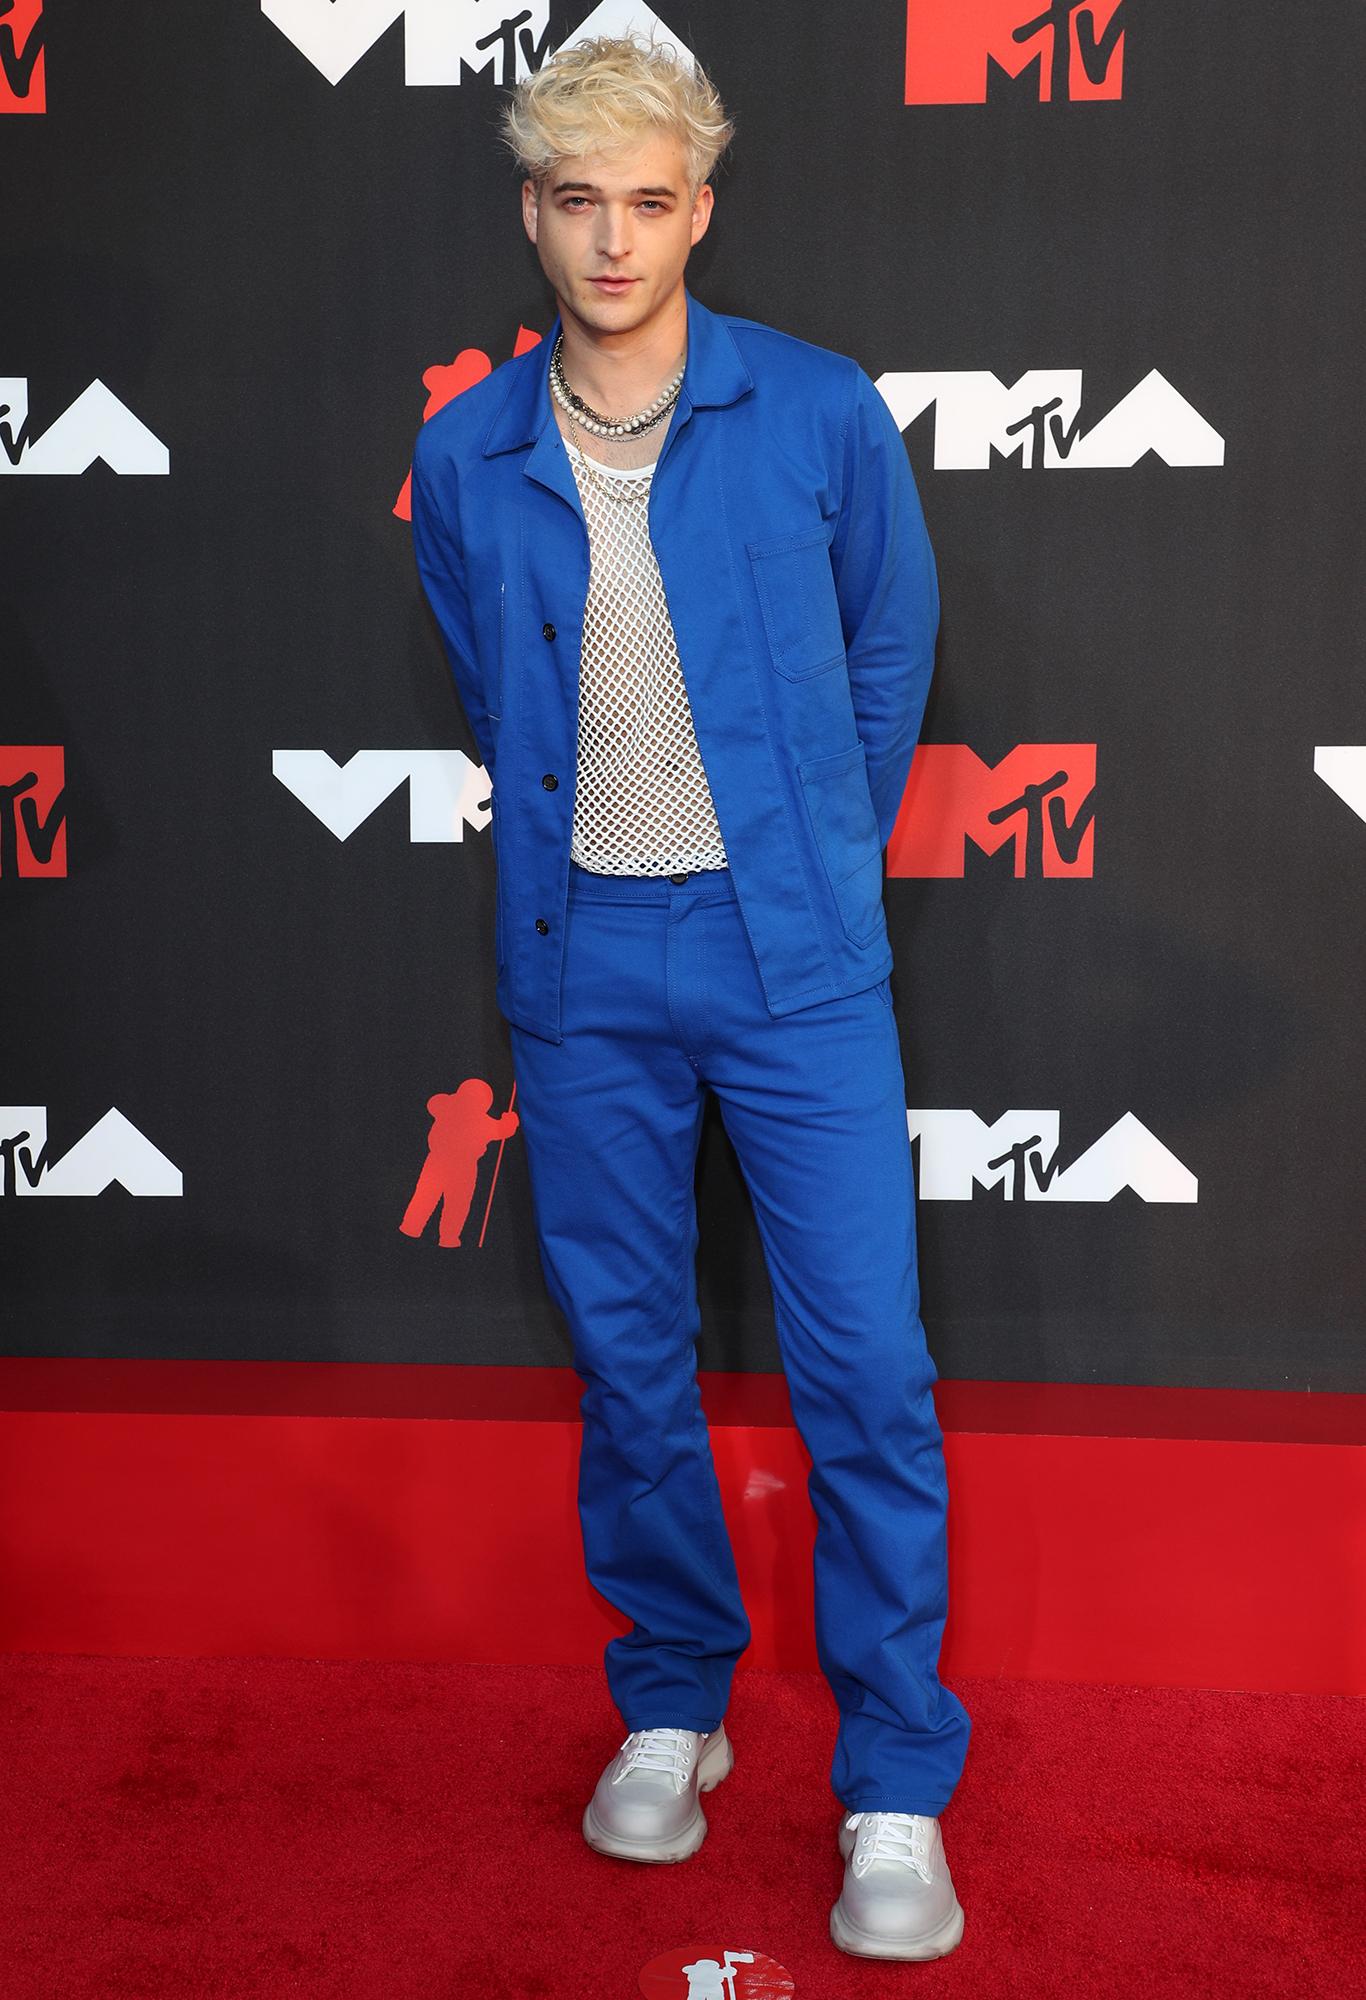 Eben arrives at the 2021 MTV Video Music Awards